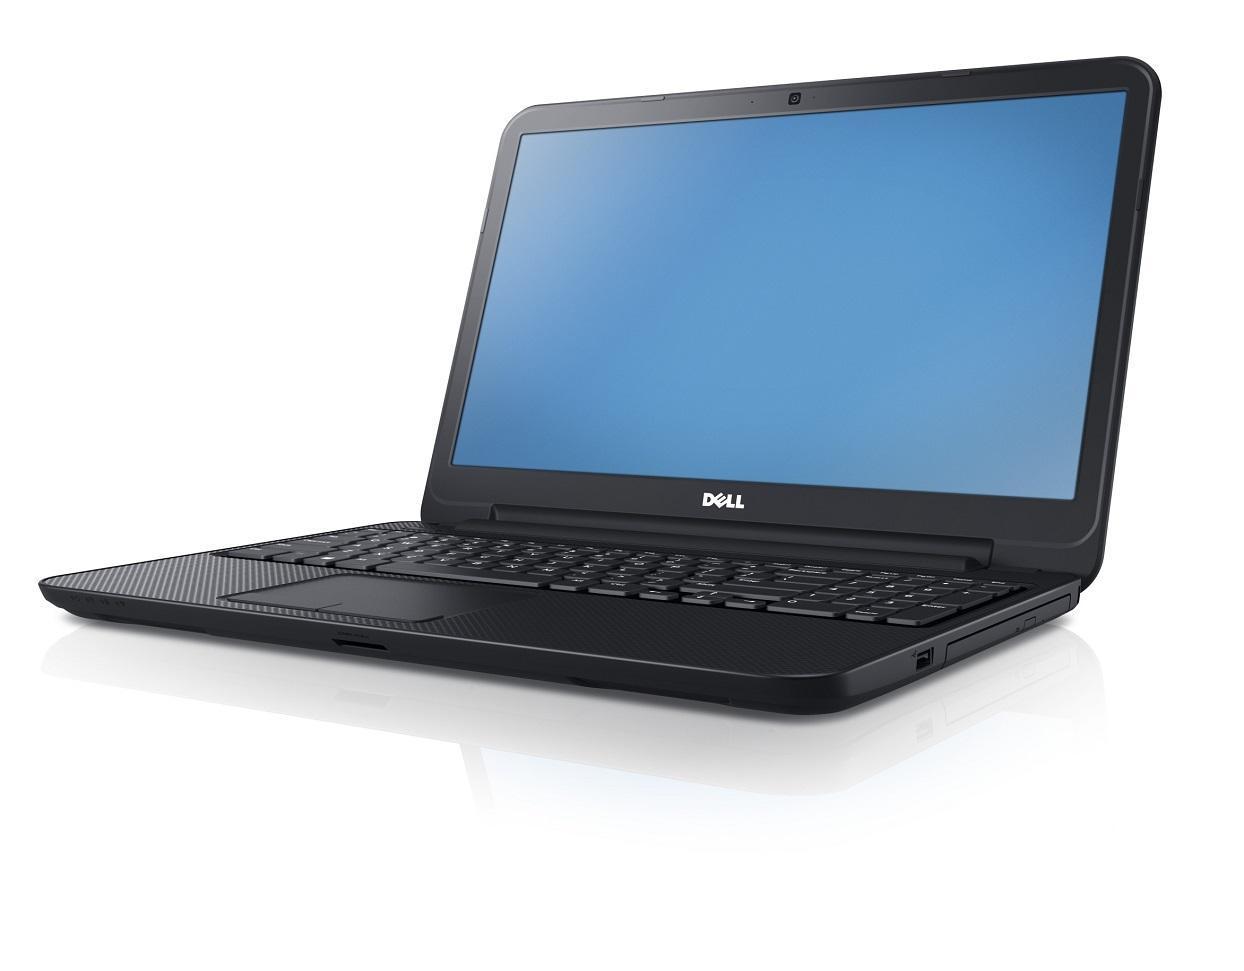 ноутбук Dell Inspiron 3537